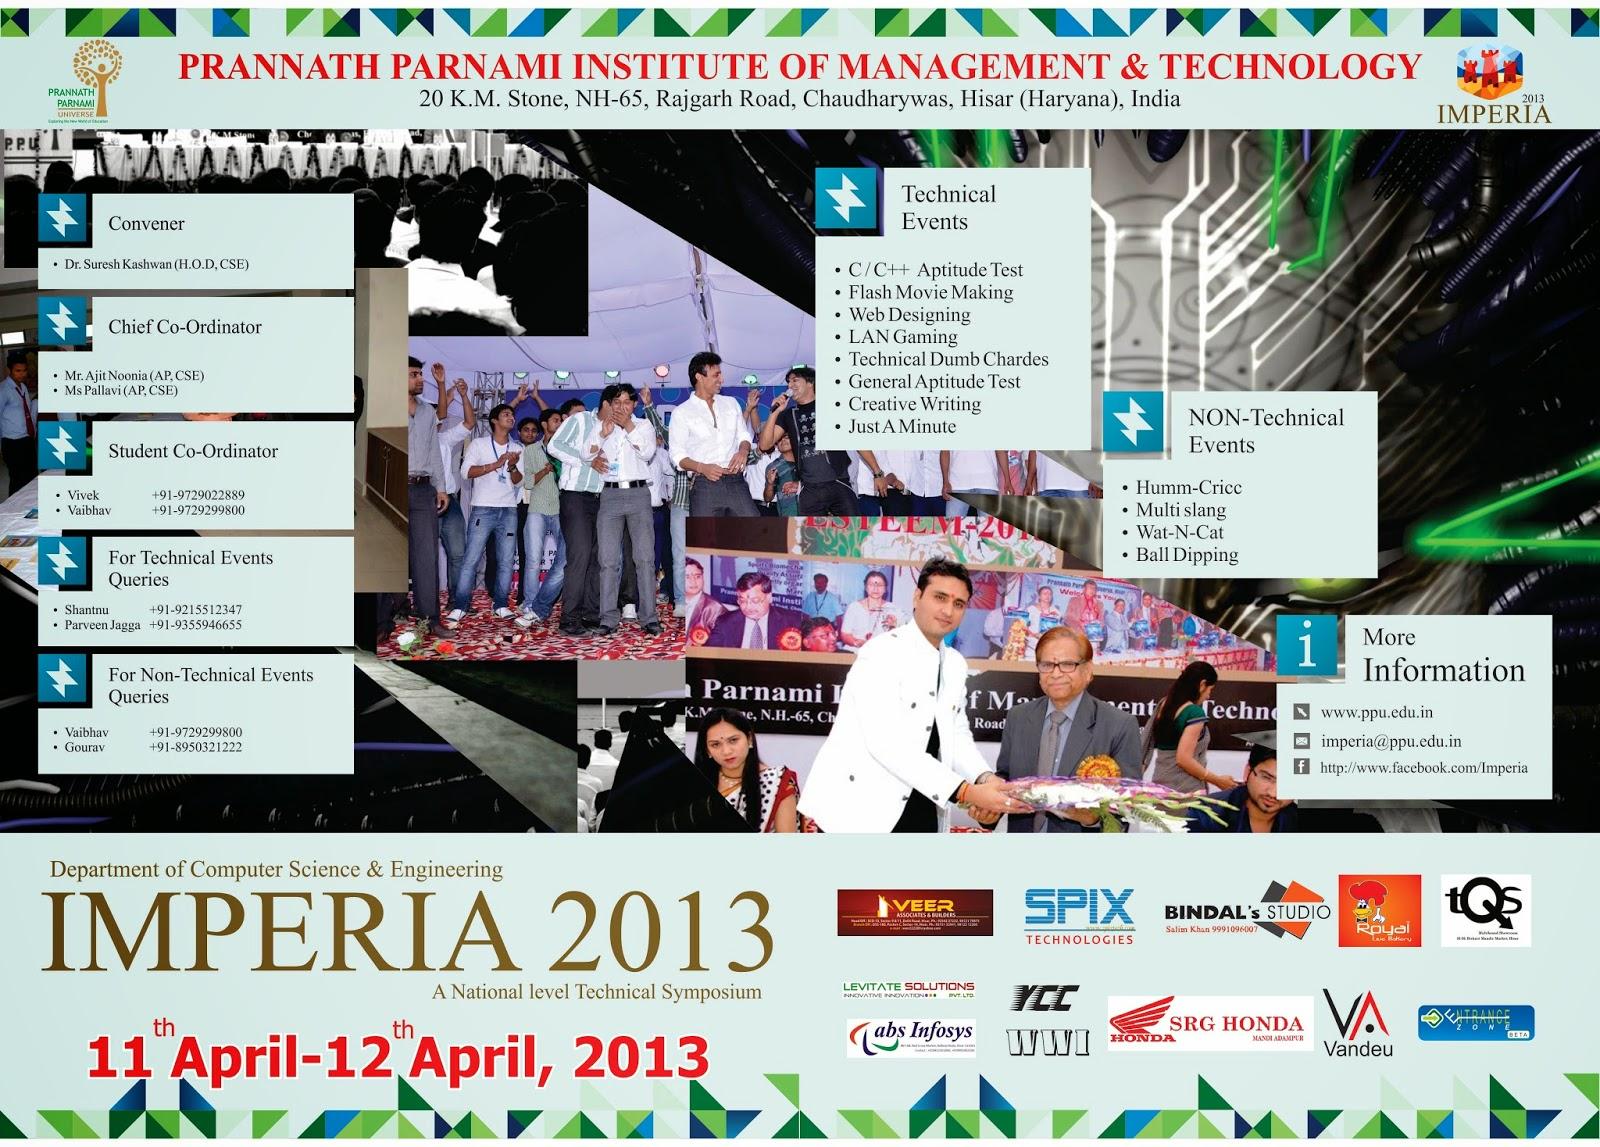 Poster design for college fest - Poster Design For College Tech Fest Imperia